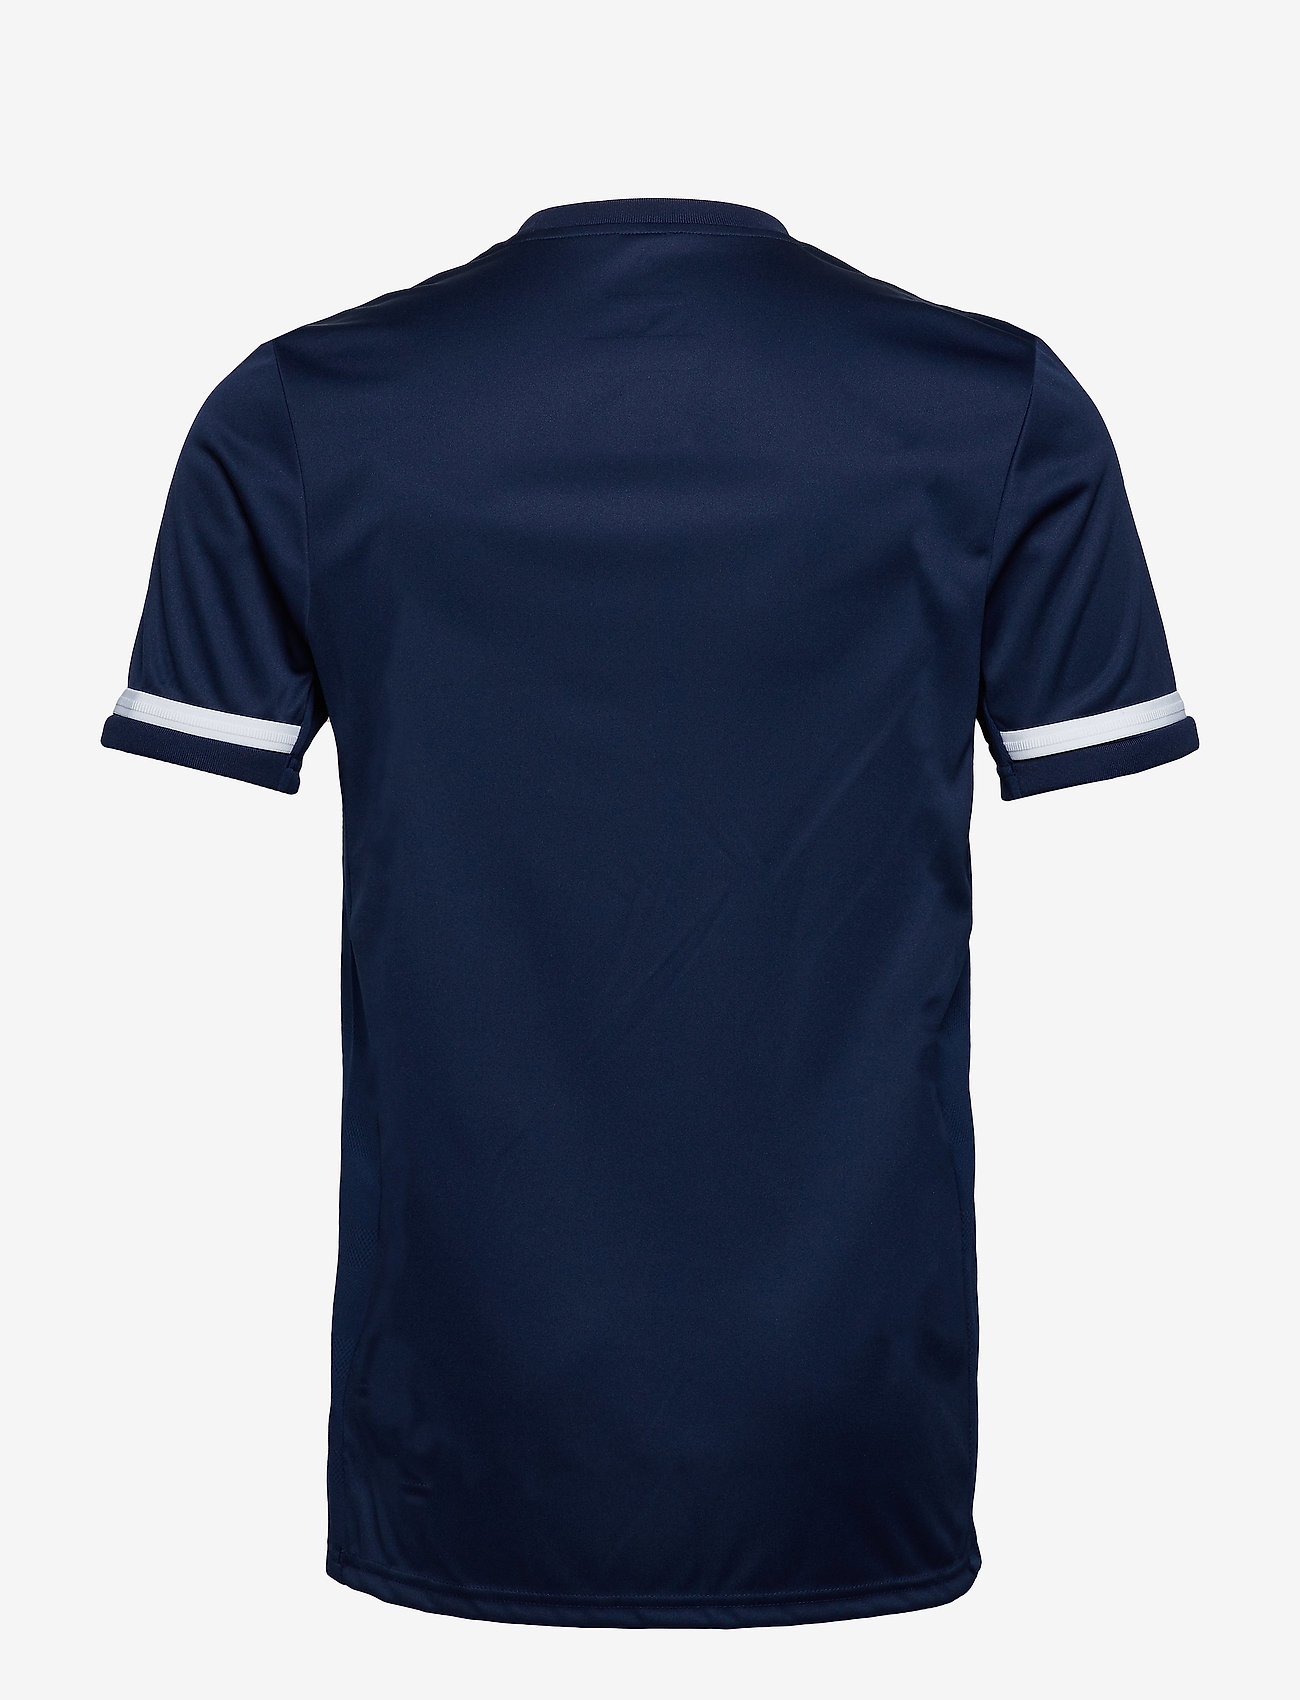 adidas Performance - Team 19 Short Sleeve Jersey - football shirts - navy - 1